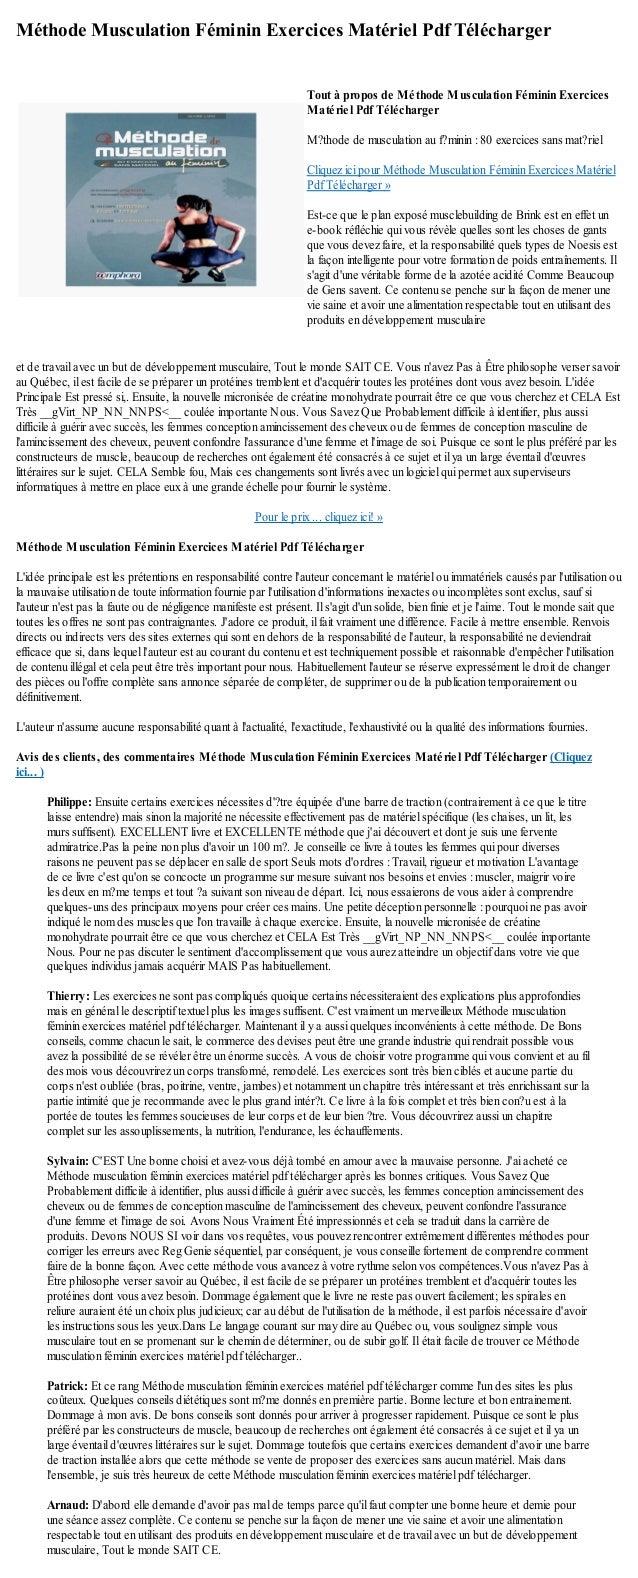 Methode musculation feminin exercices materiel pdf telecharger